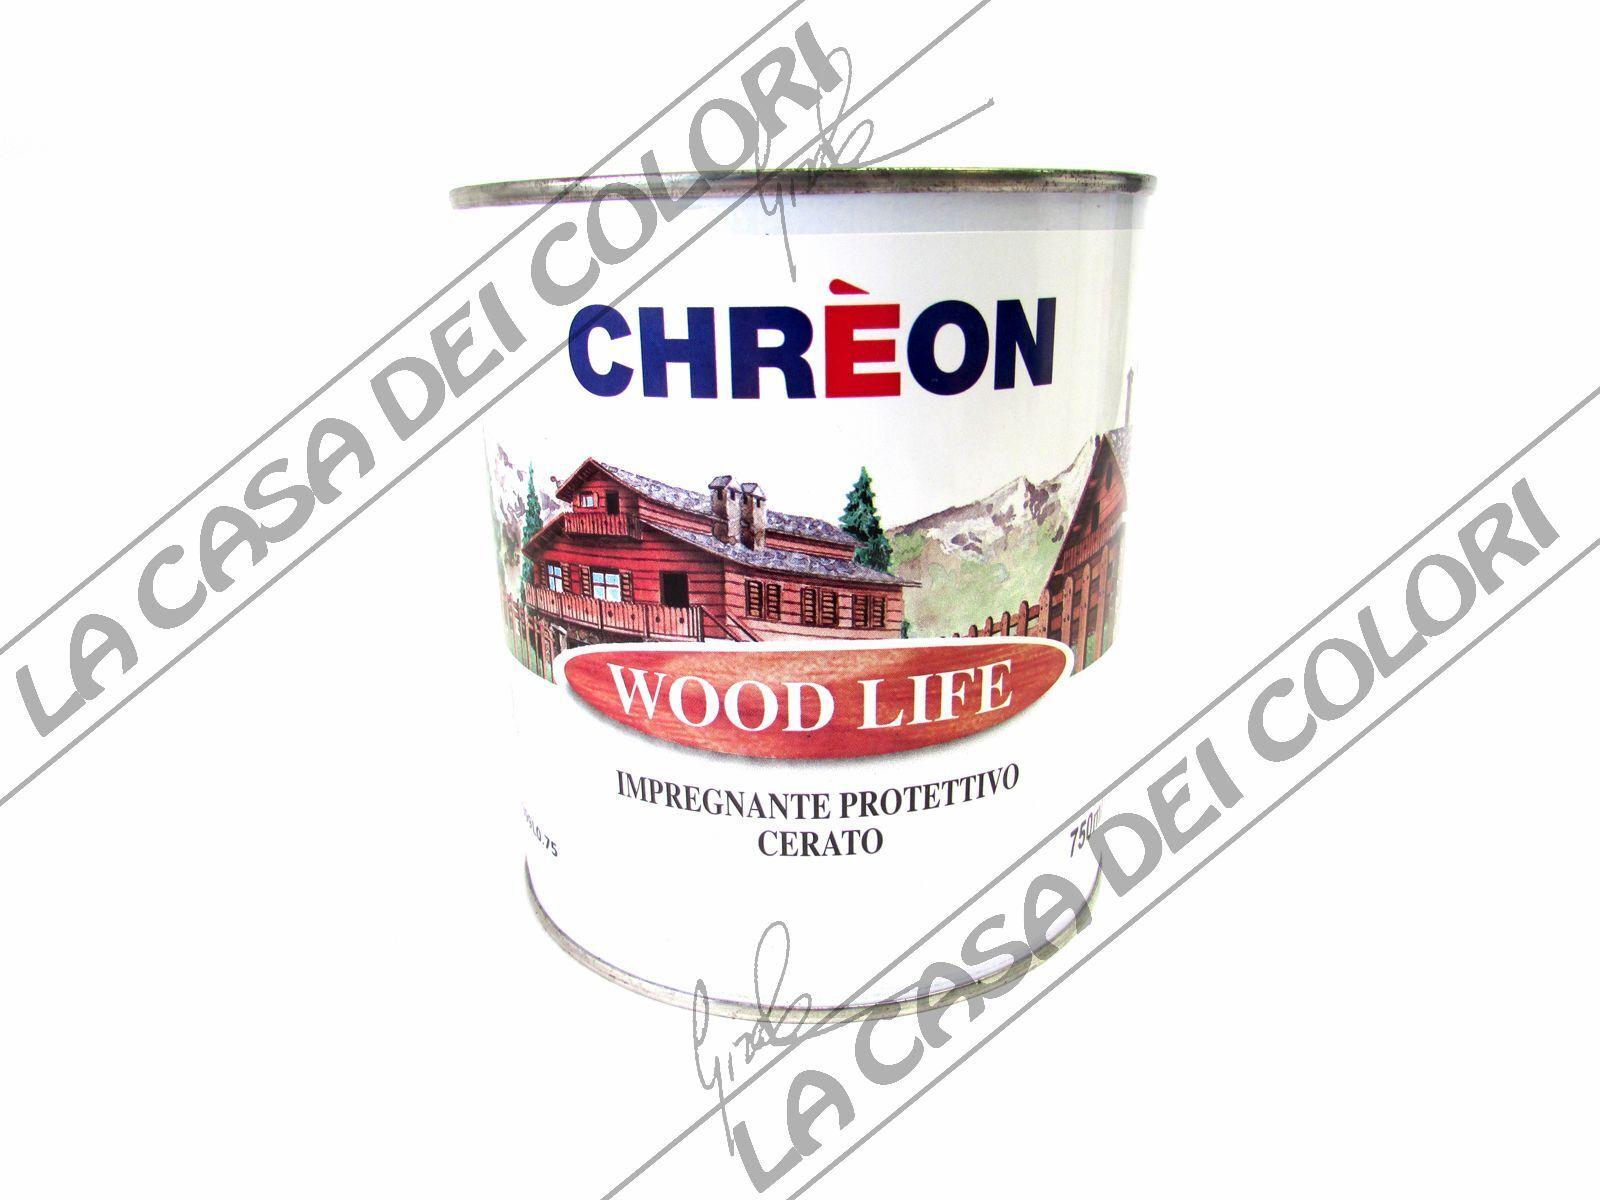 CHREON - WOOD LIFE IMPREGNANTE CERATO - TINTE CARTELLA CARTELLA CARTELLA - 750 ml- in offerta -50% b4301d